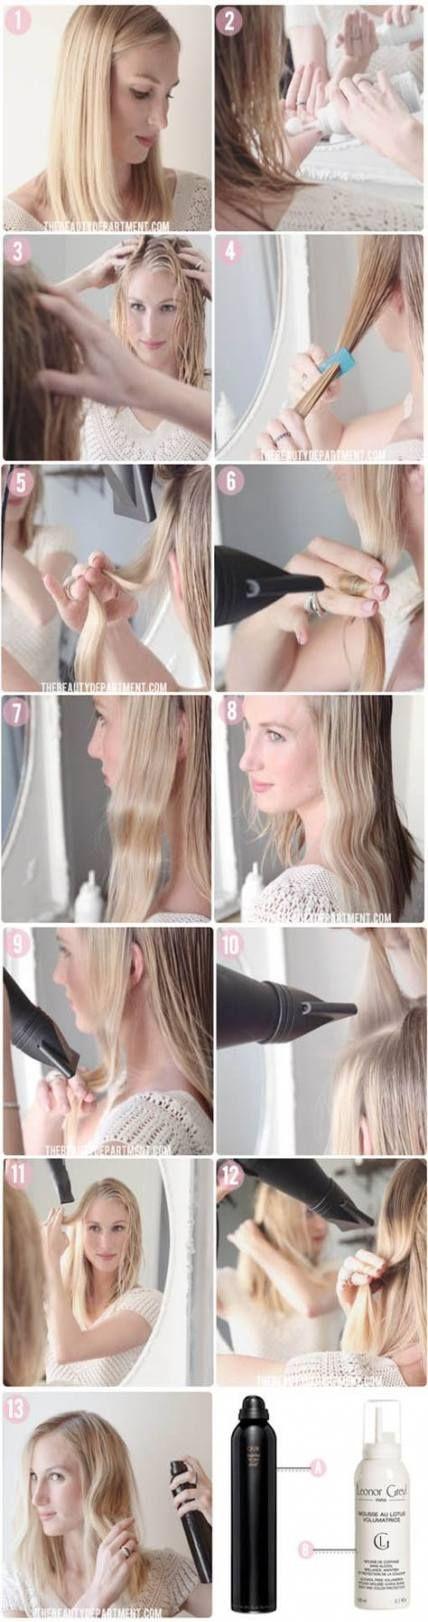 Trendy Hair Tutorial Bob The Beauty Department 43 Ideas